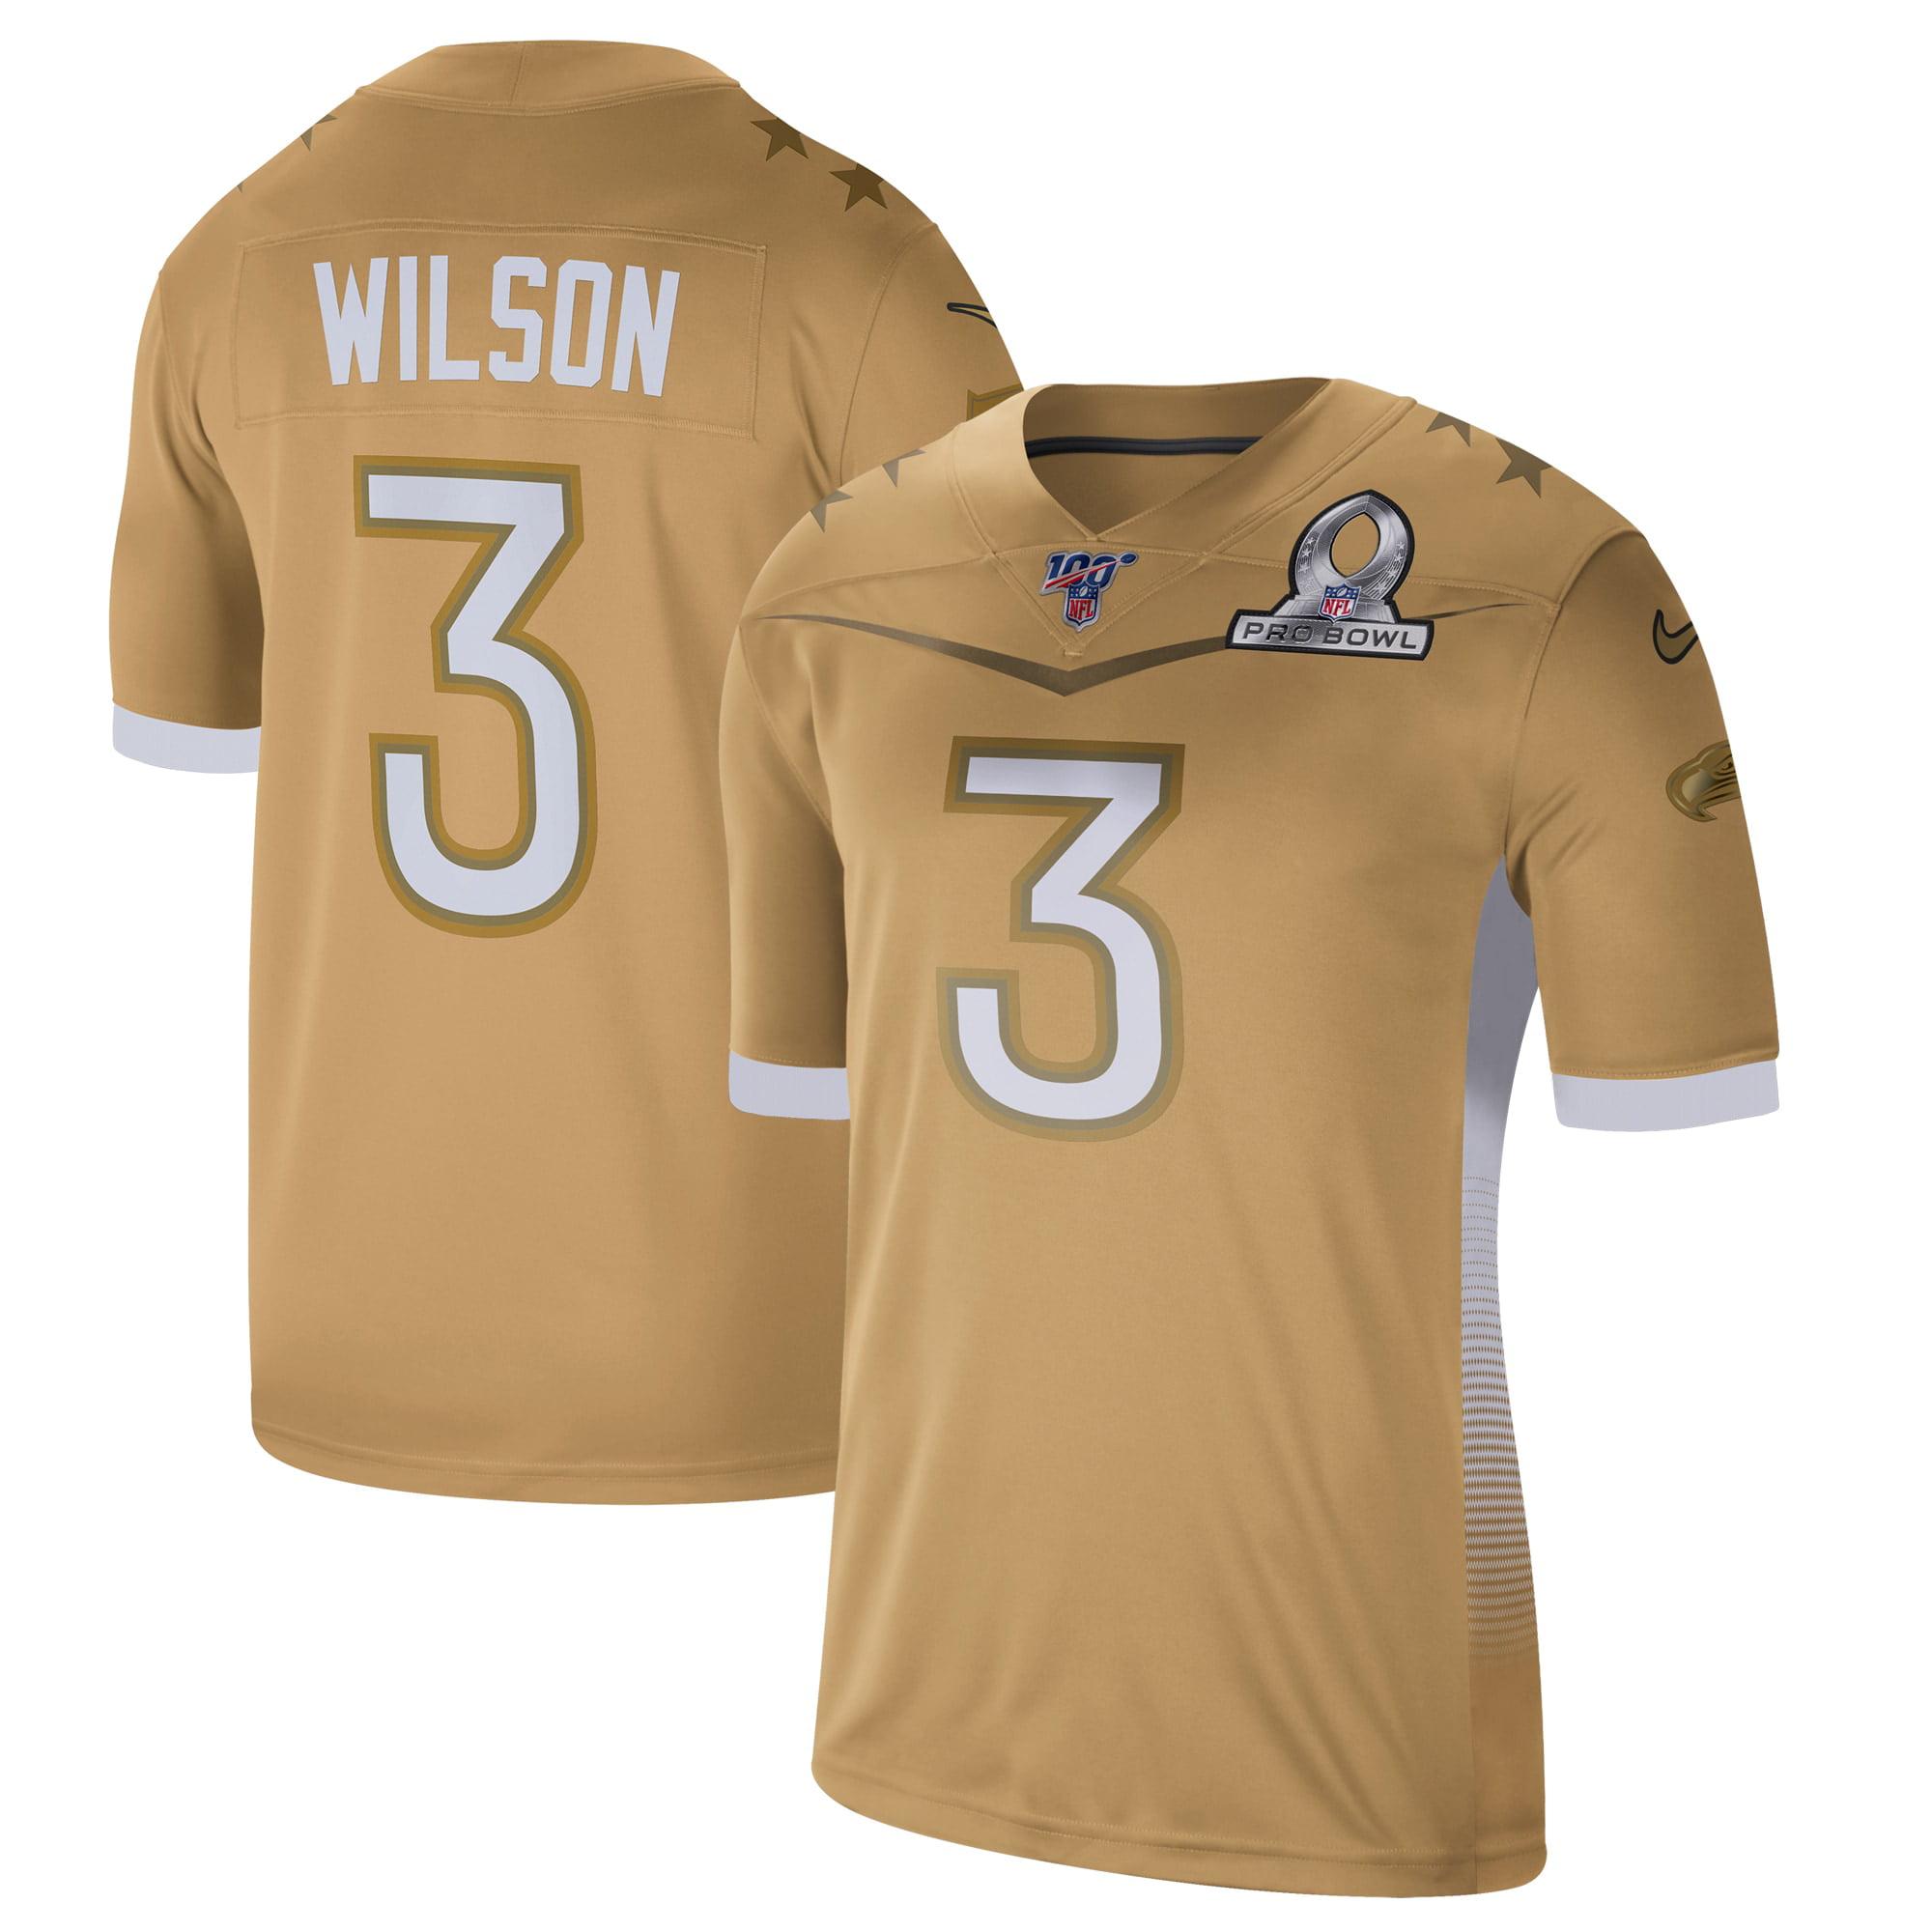 Russell Wilson Nike 2020 NFC Pro Bowl Game Jersey - Gold - Walmart ...